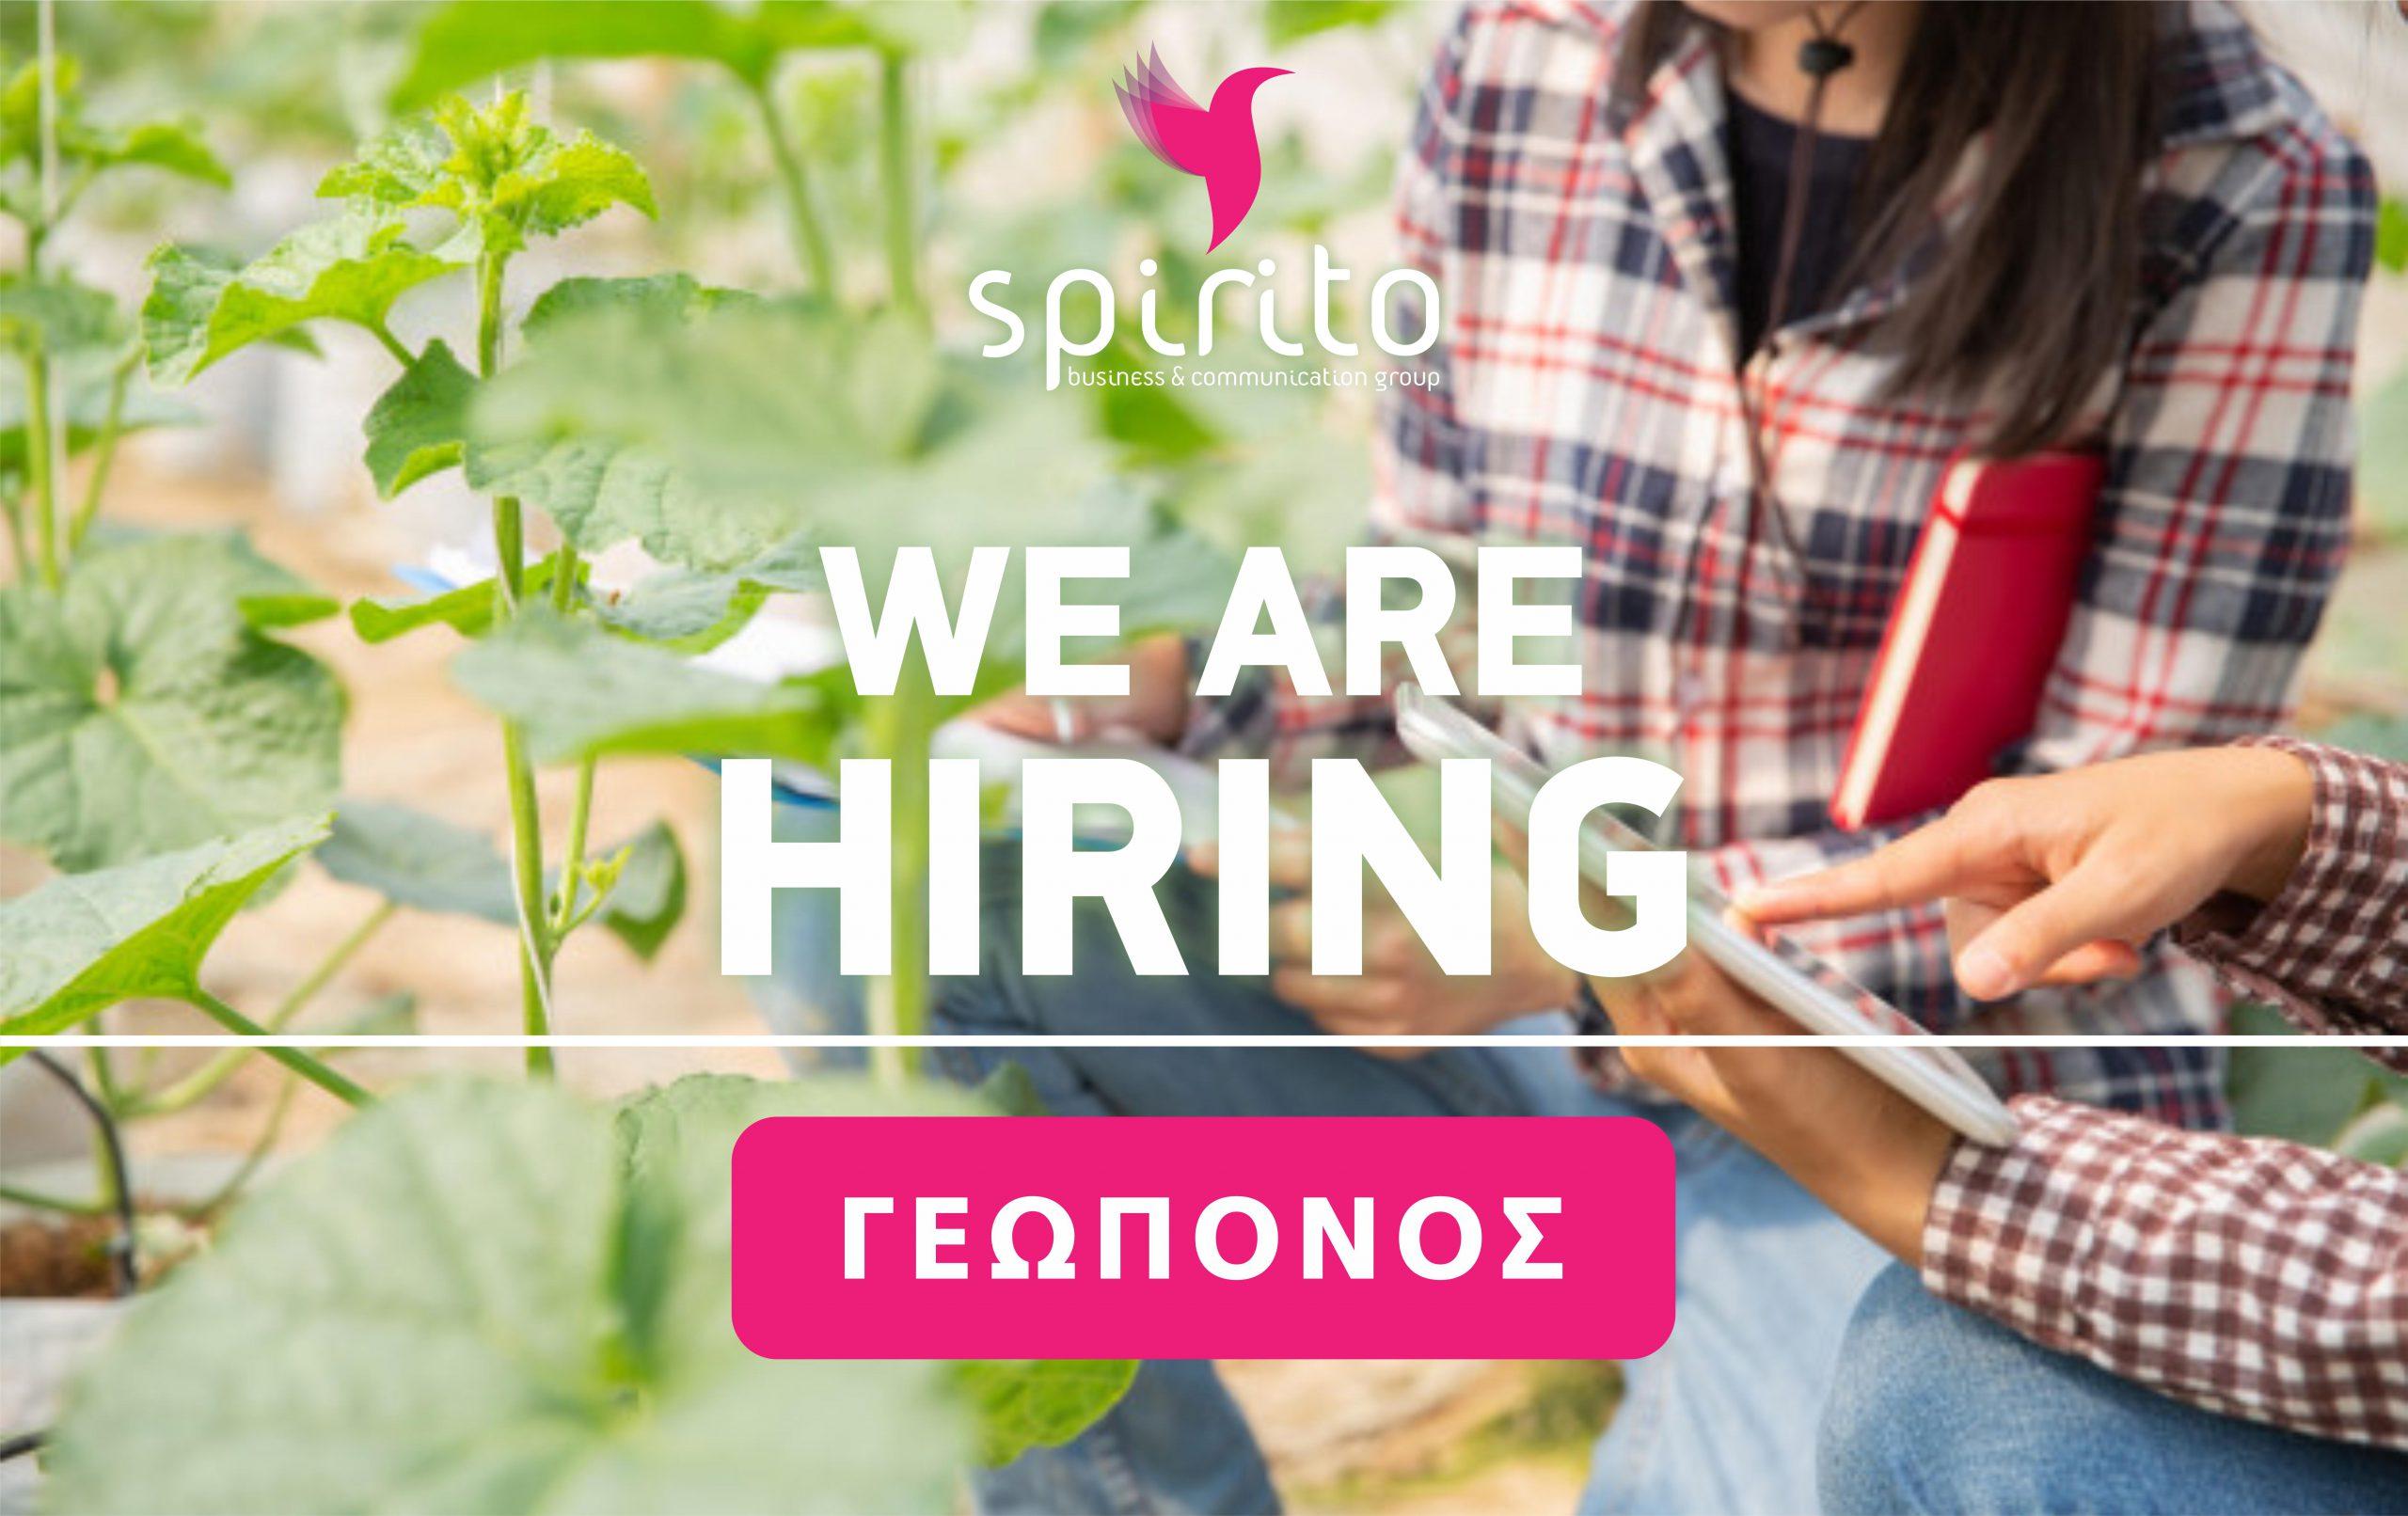 spirito we are hiring geoponos scaled